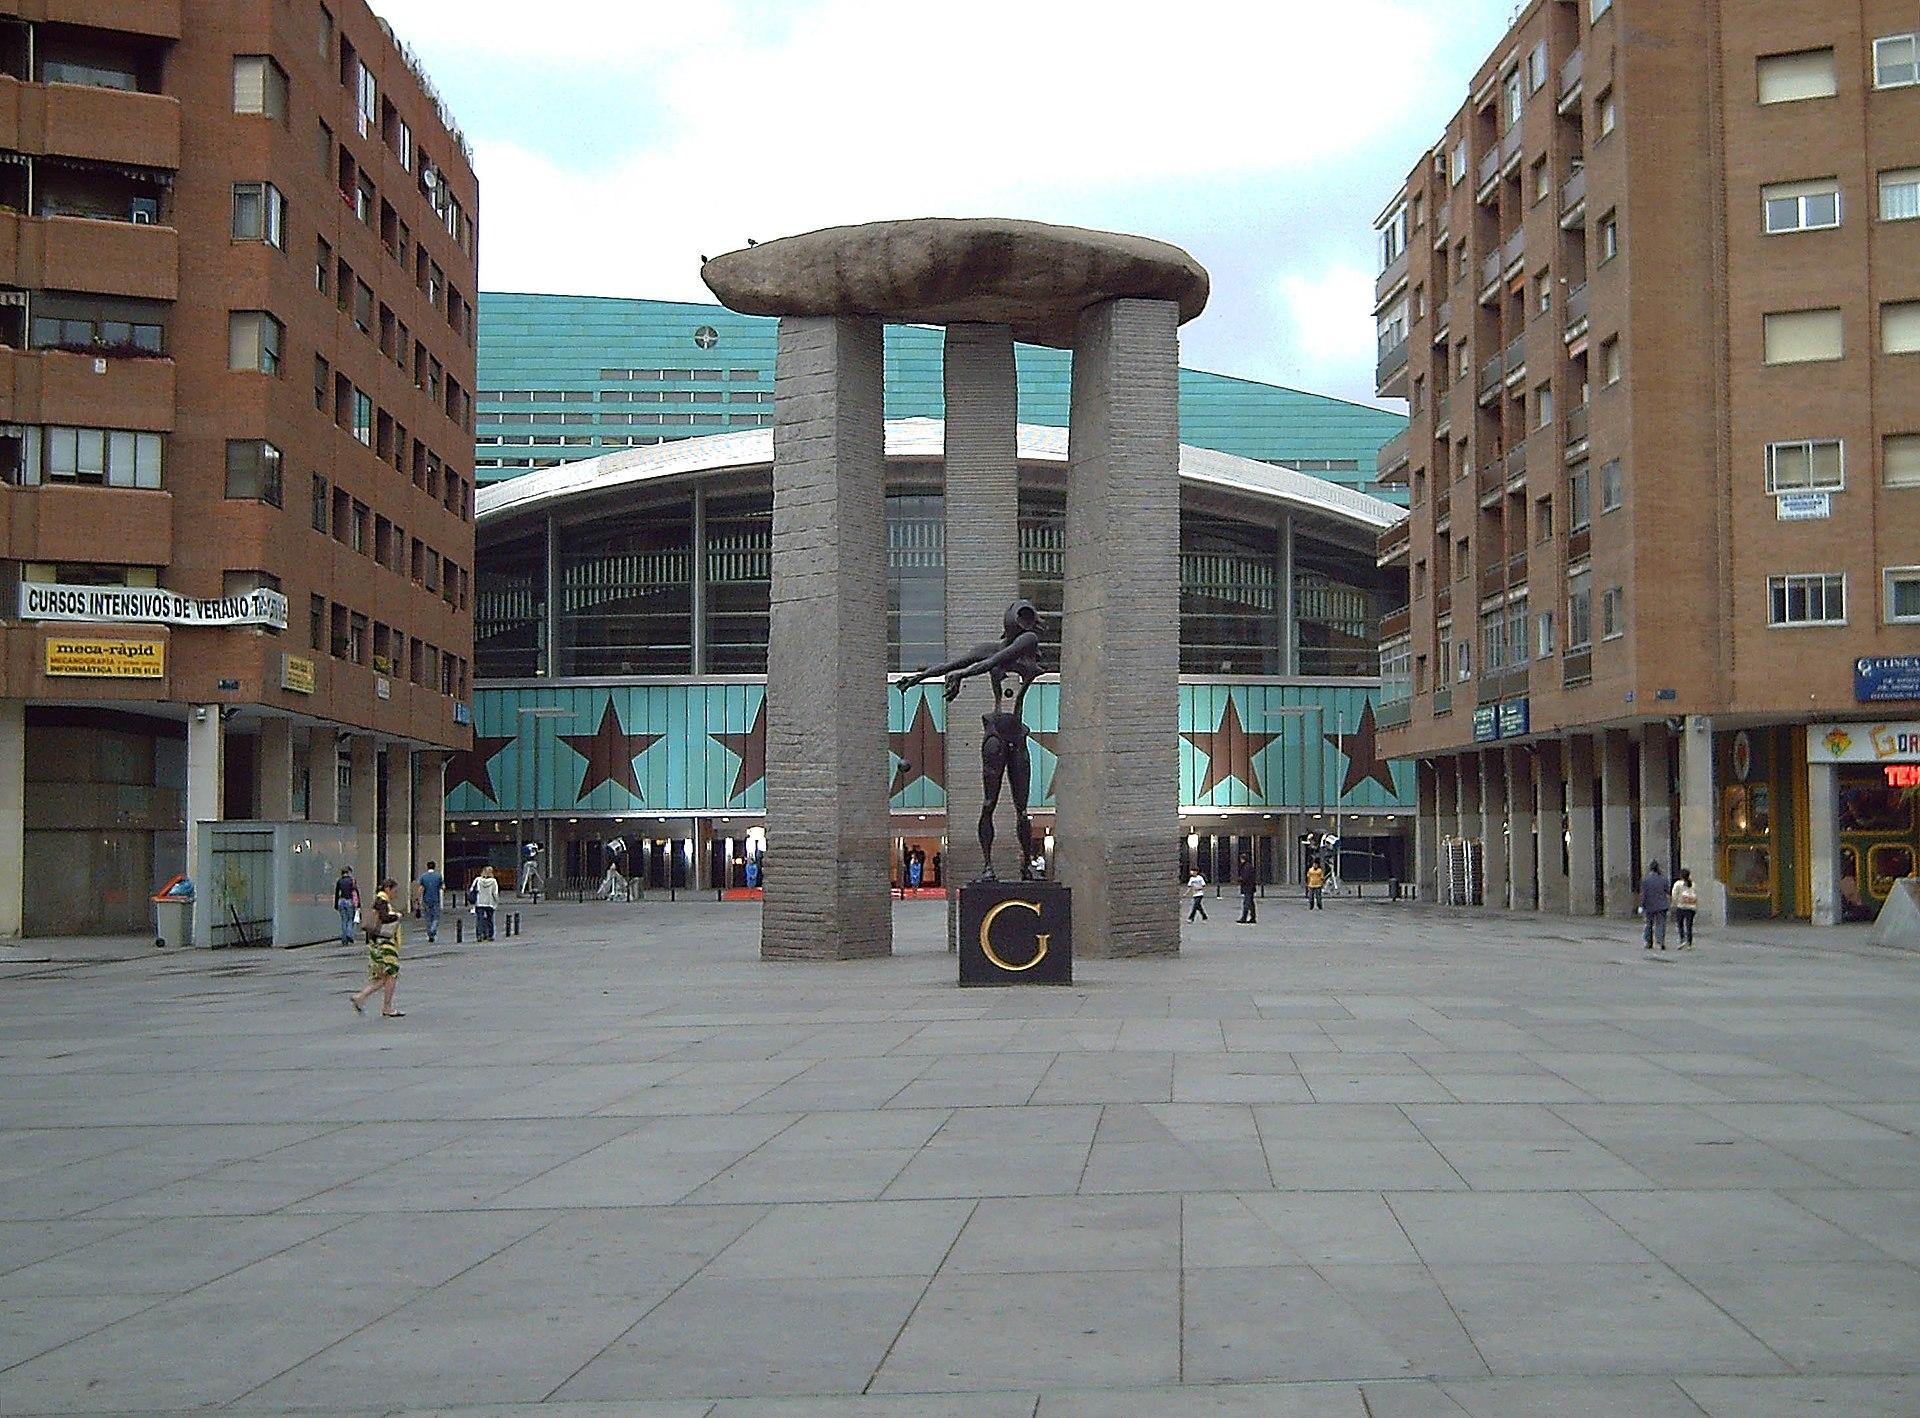 Goya madrid wikipedia la enciclopedia libre for Codigo postal del barrio de salamanca en madrid